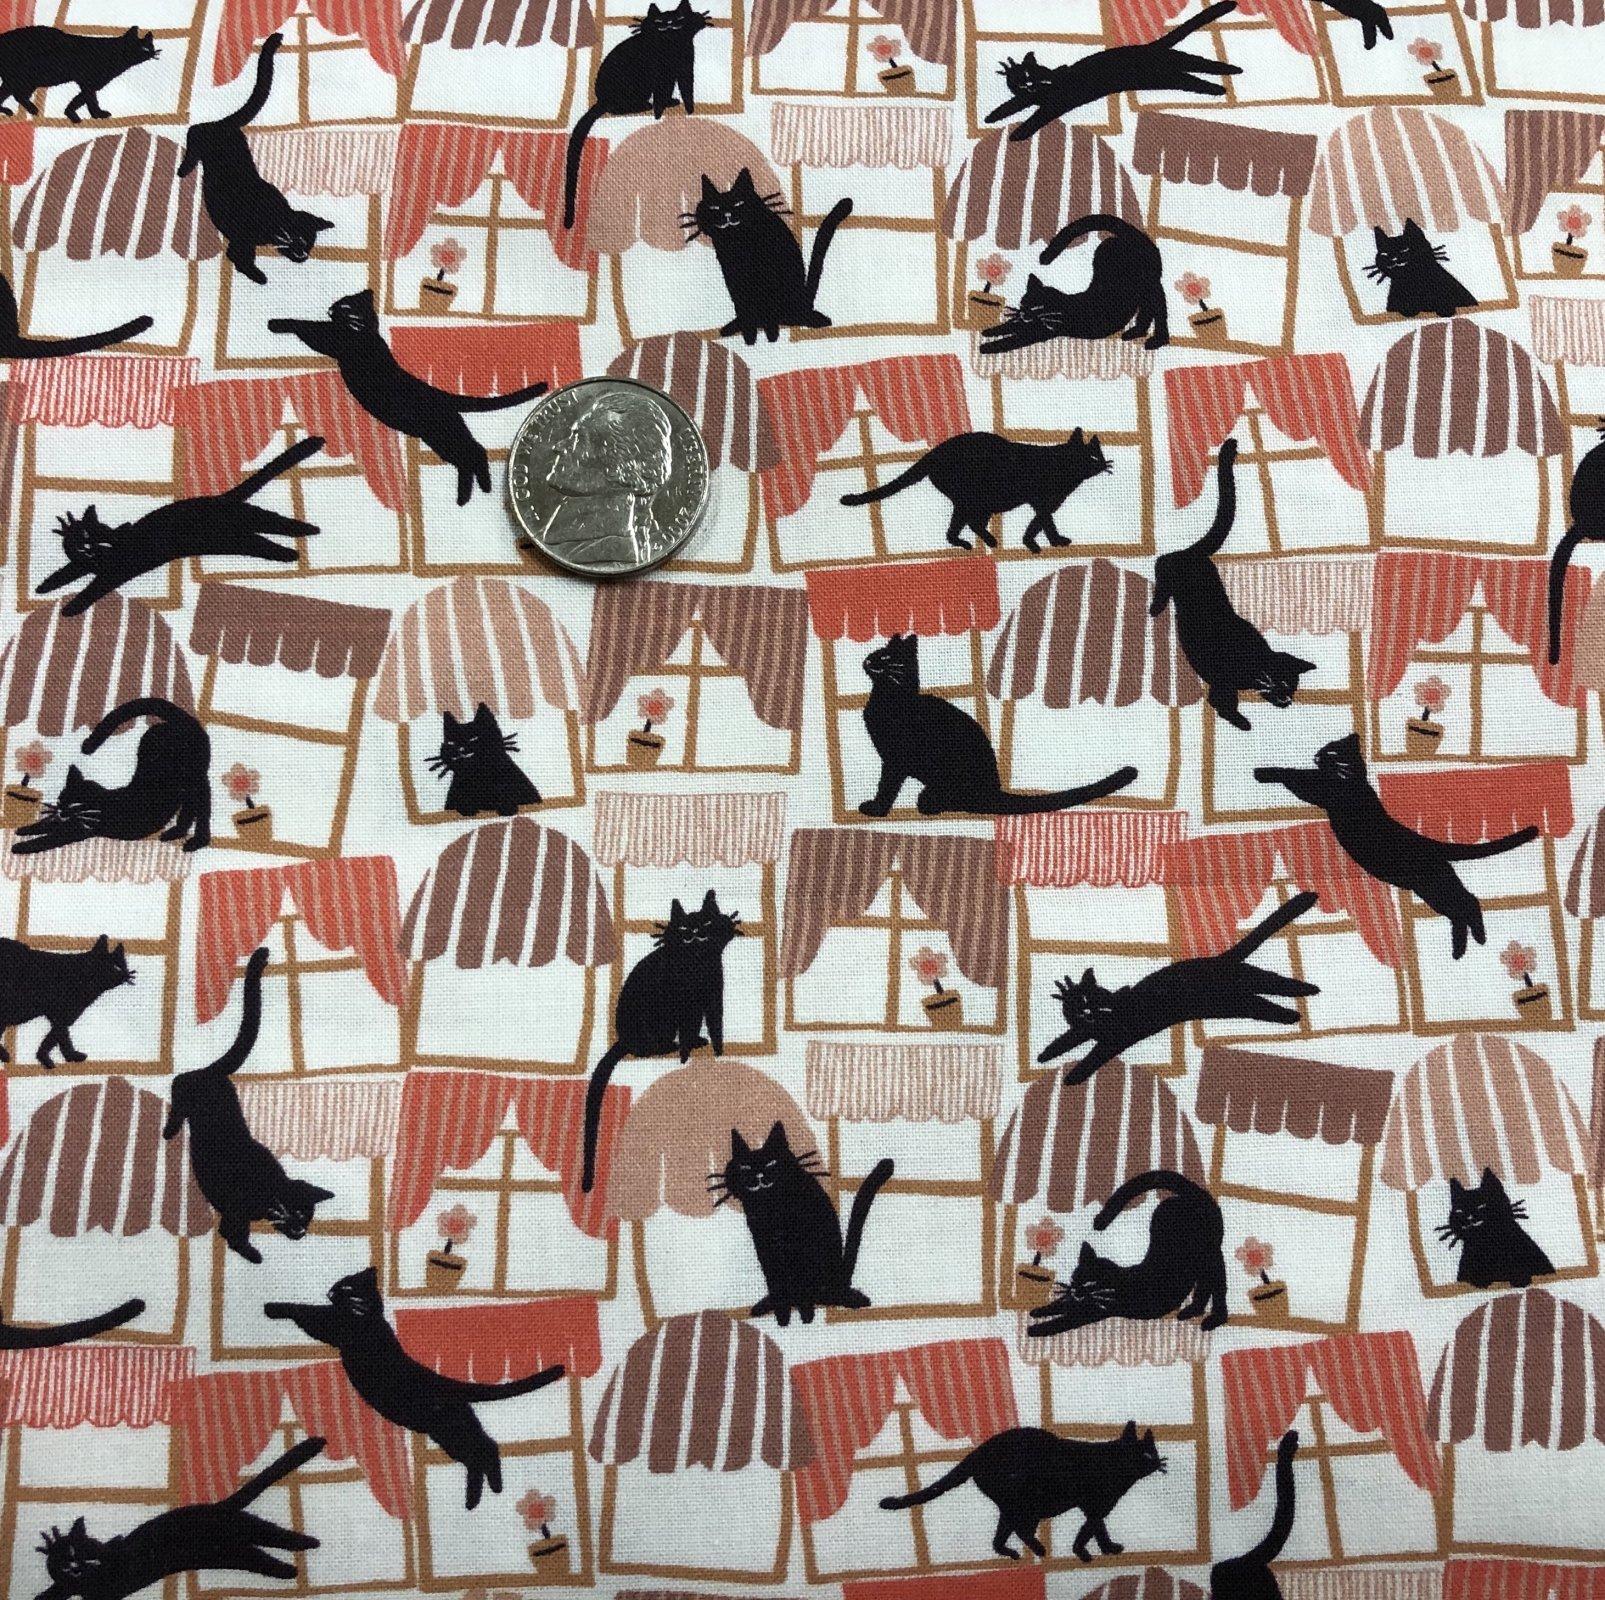 Hats for Cats - Cat Print Fabrics - Paintbrush Studio